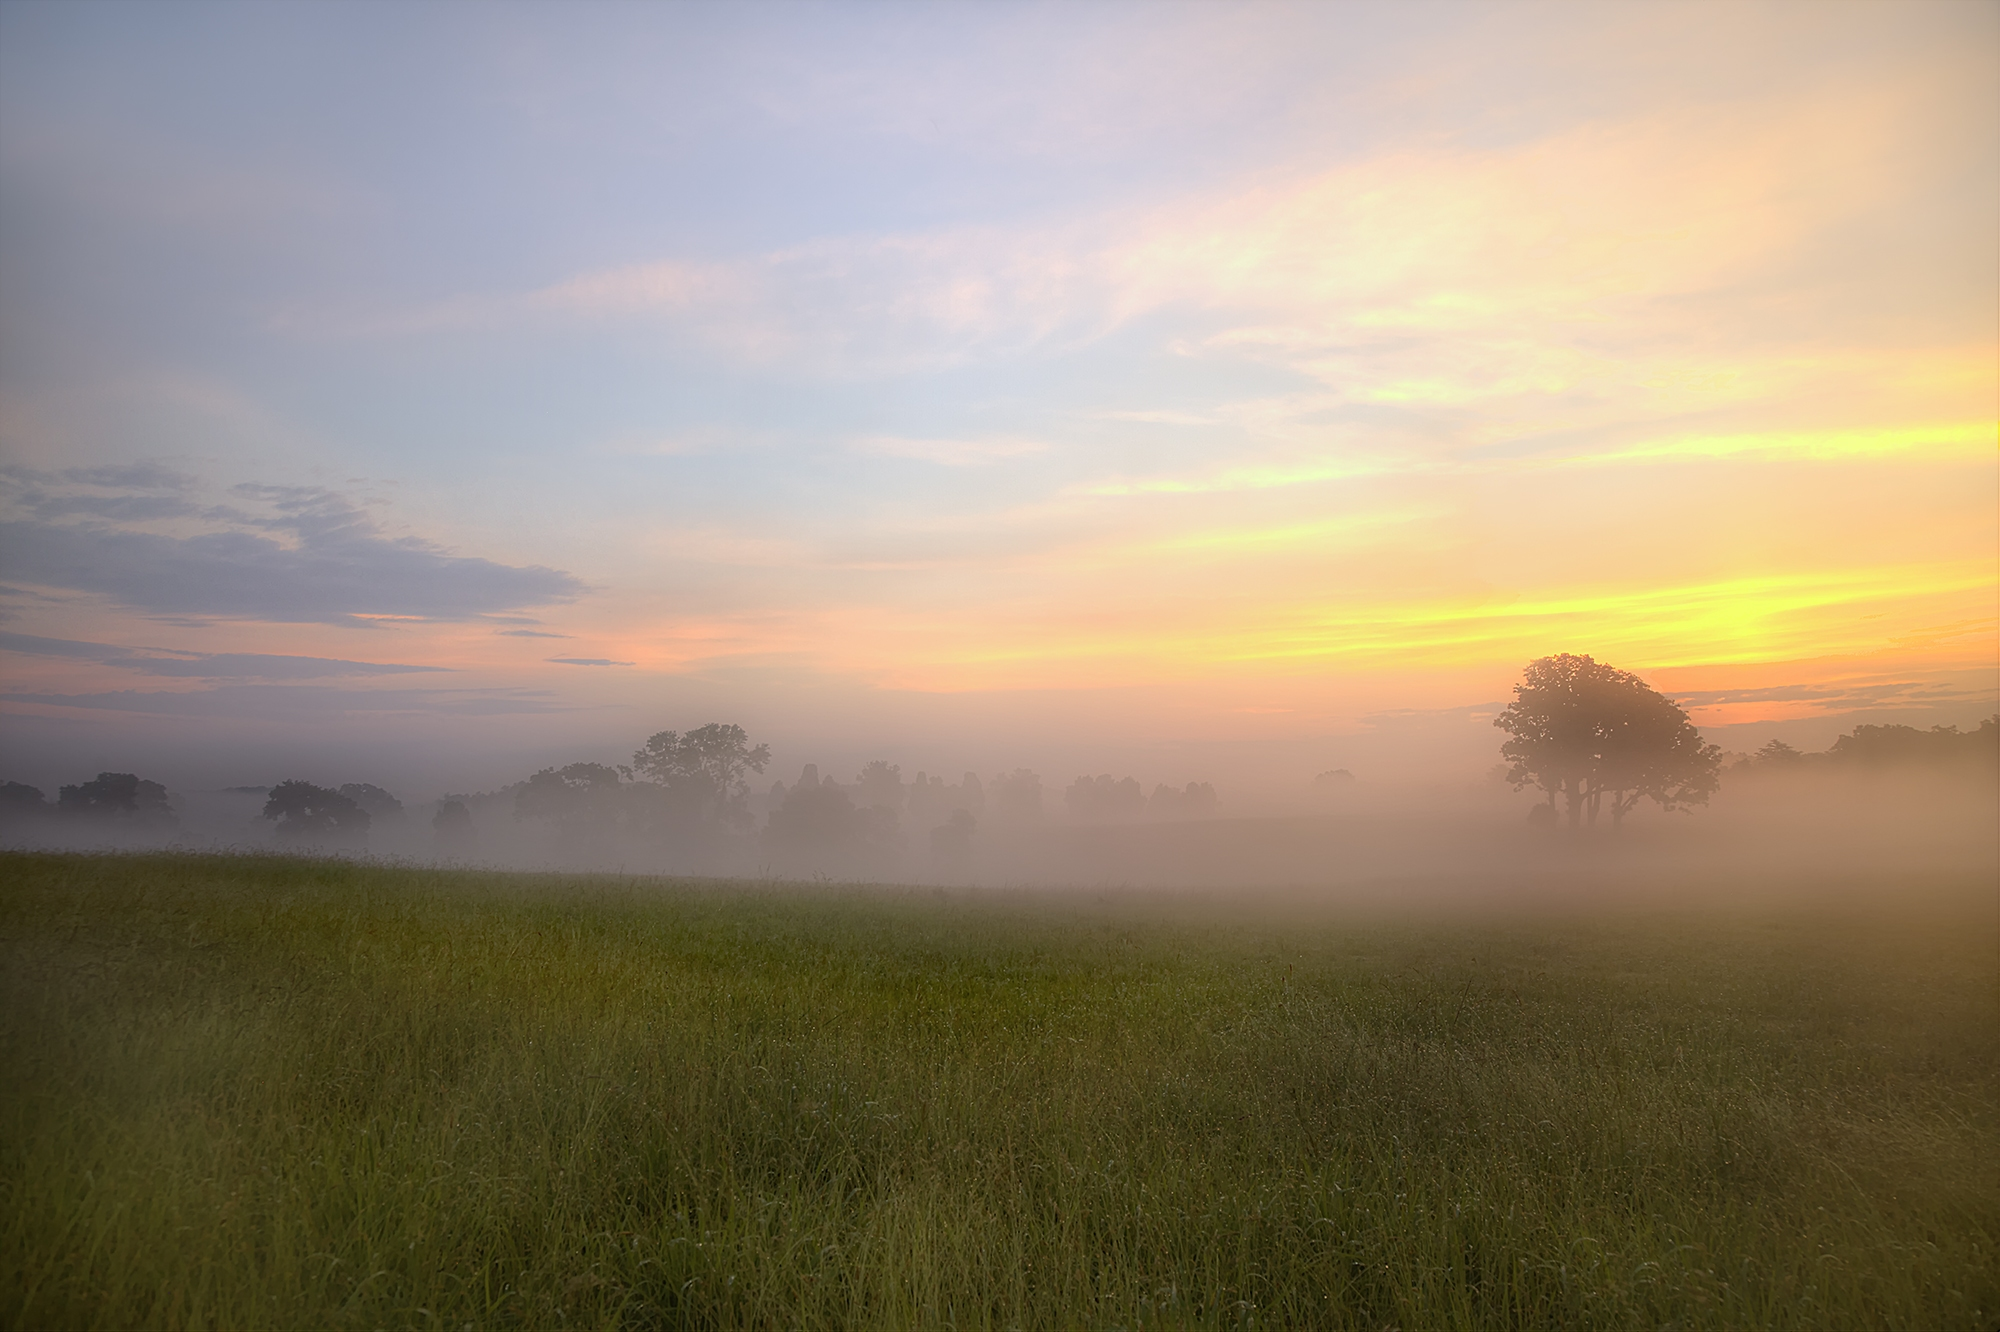 sun fog sunrise trees - photo #29